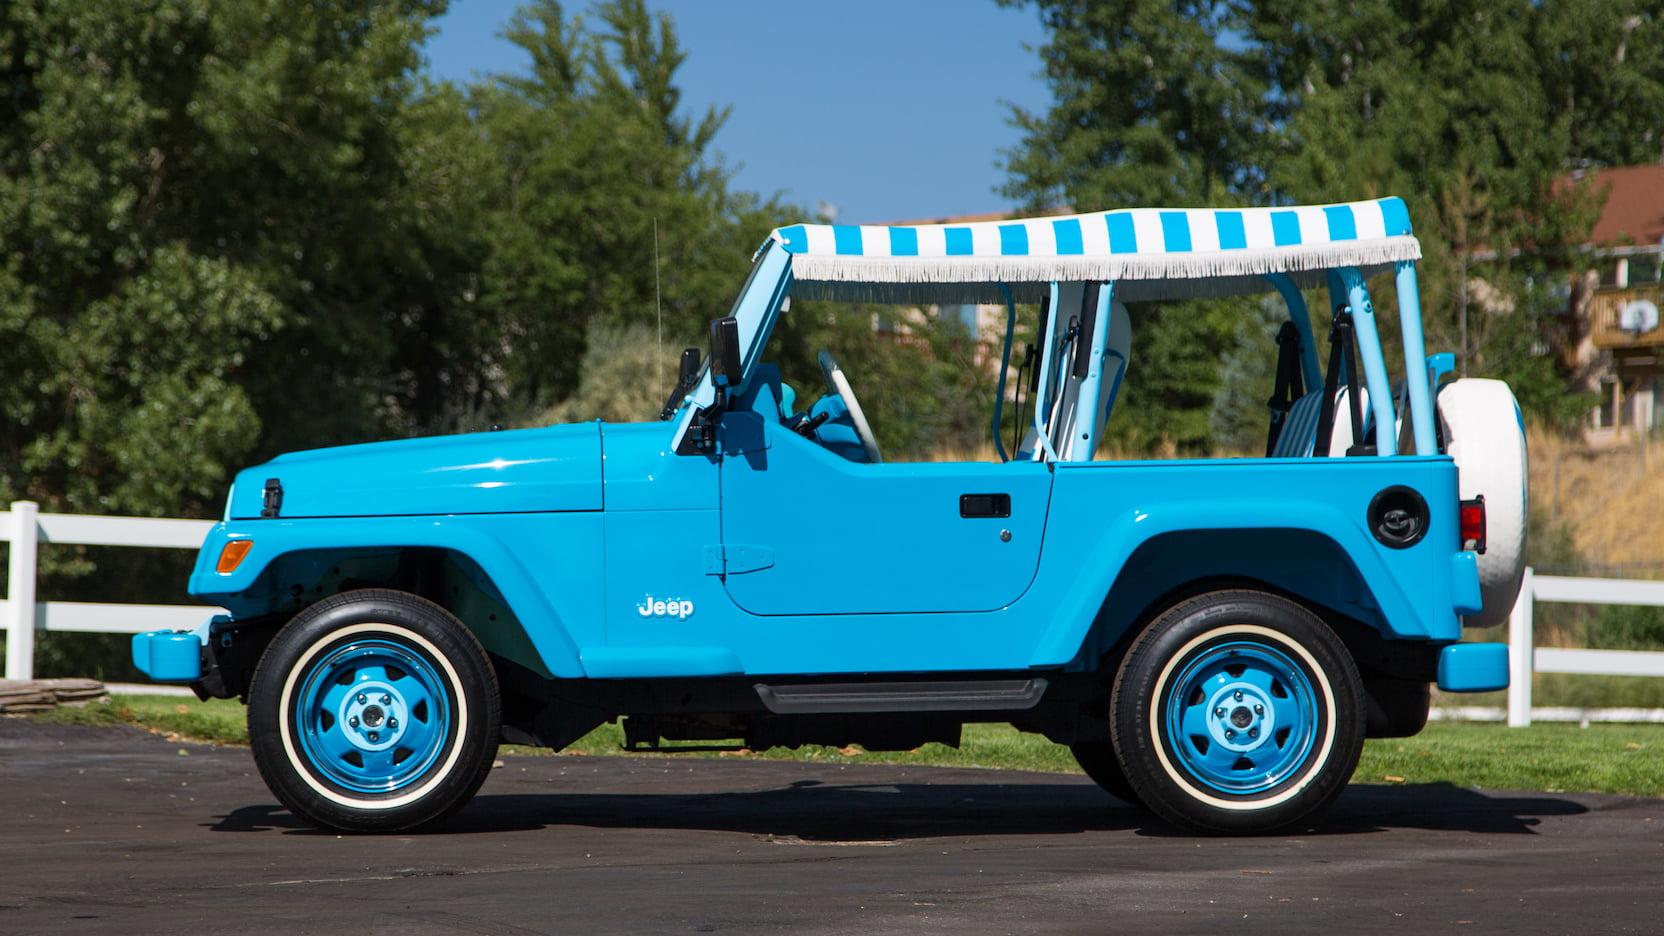 2004 Jeep Wrangler jolly side profile